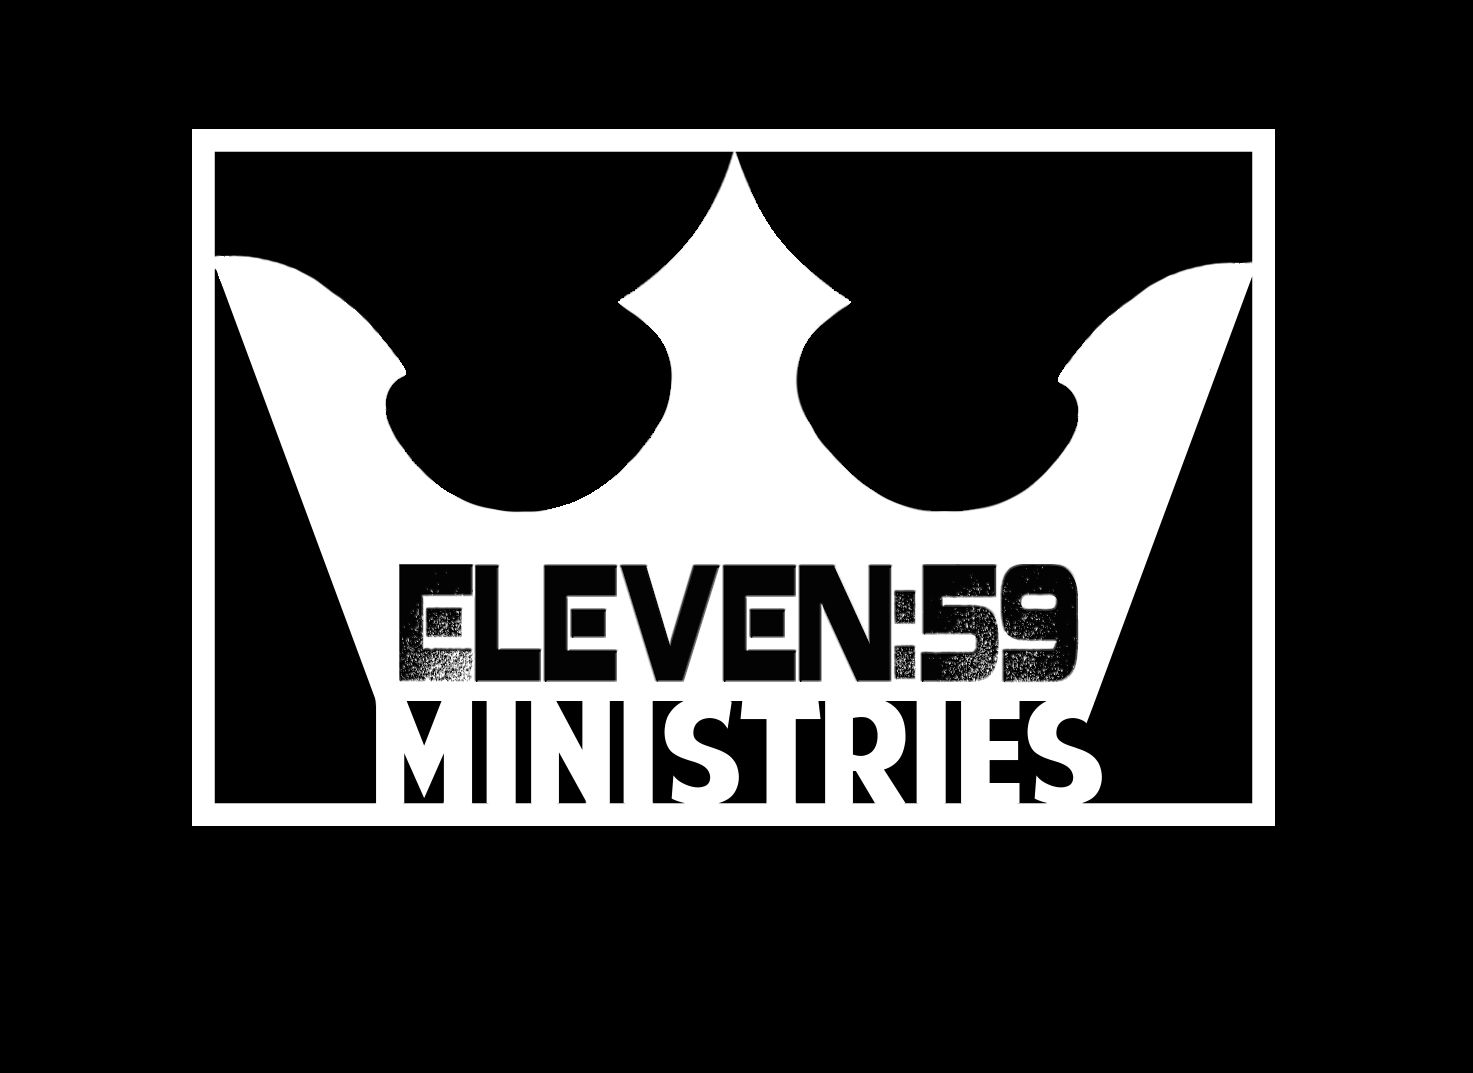 Eleven59 logo copyright 2013